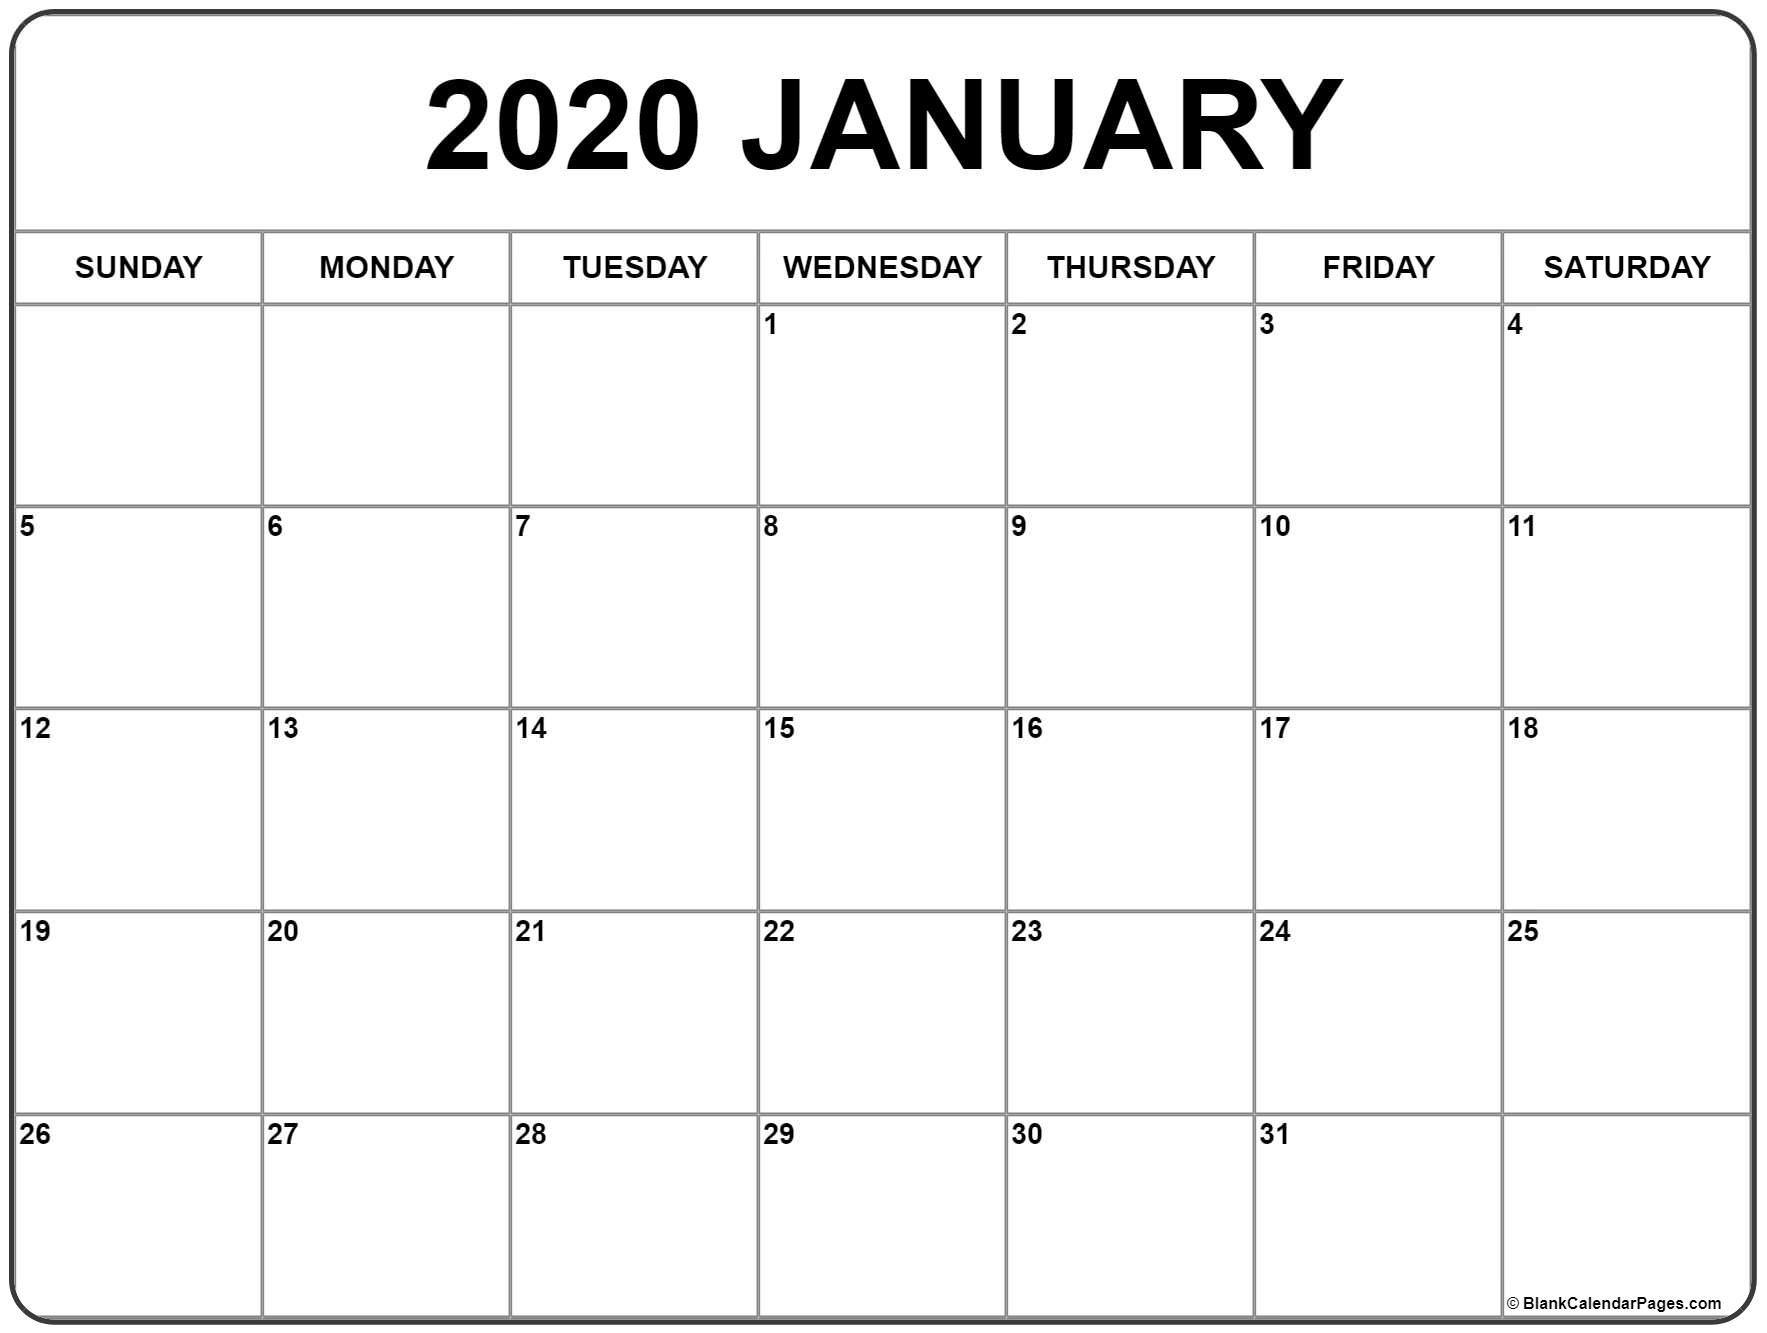 January 2020 Calendar Holidays Printable - Togo.wpart.co